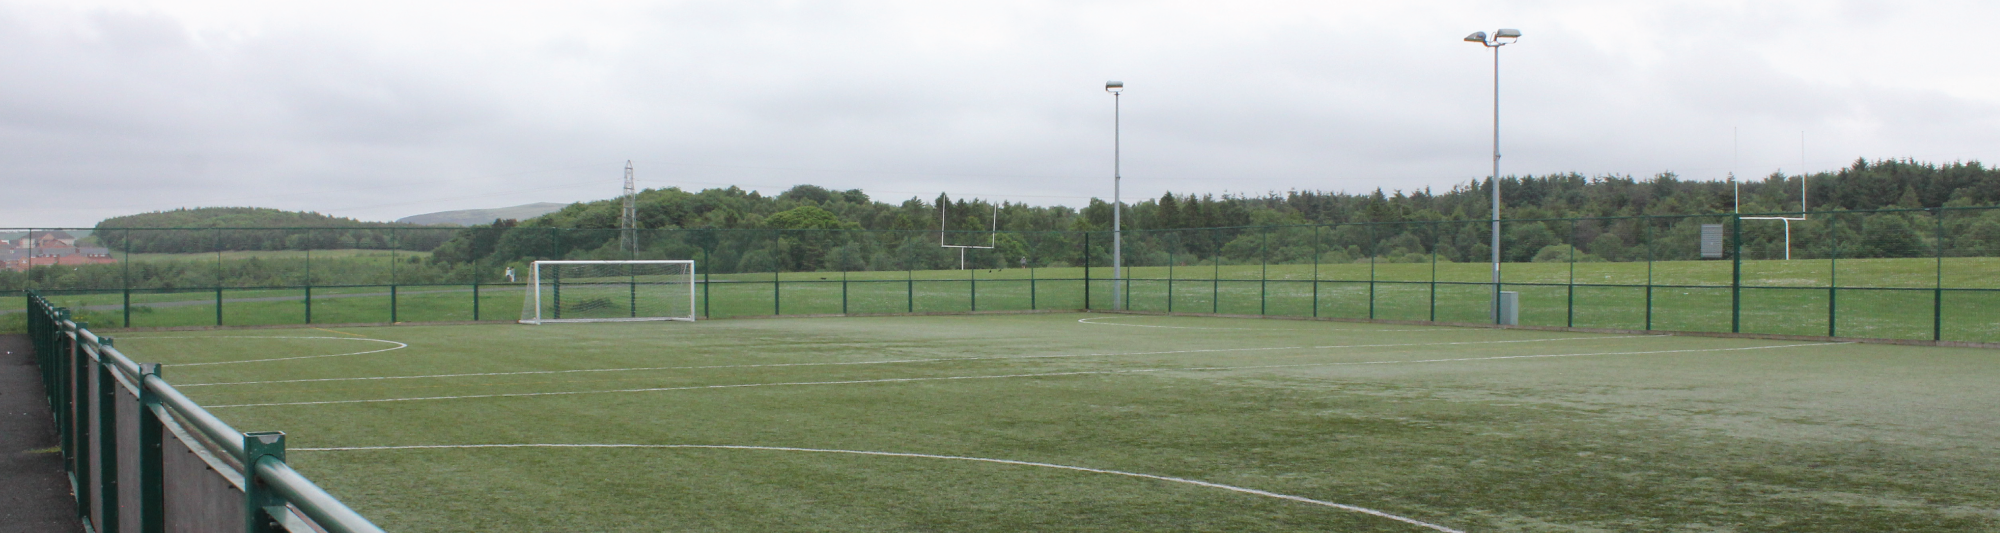 601c24faf8d Duloch Leisure Centre - Fife Sports and Leisure Trust